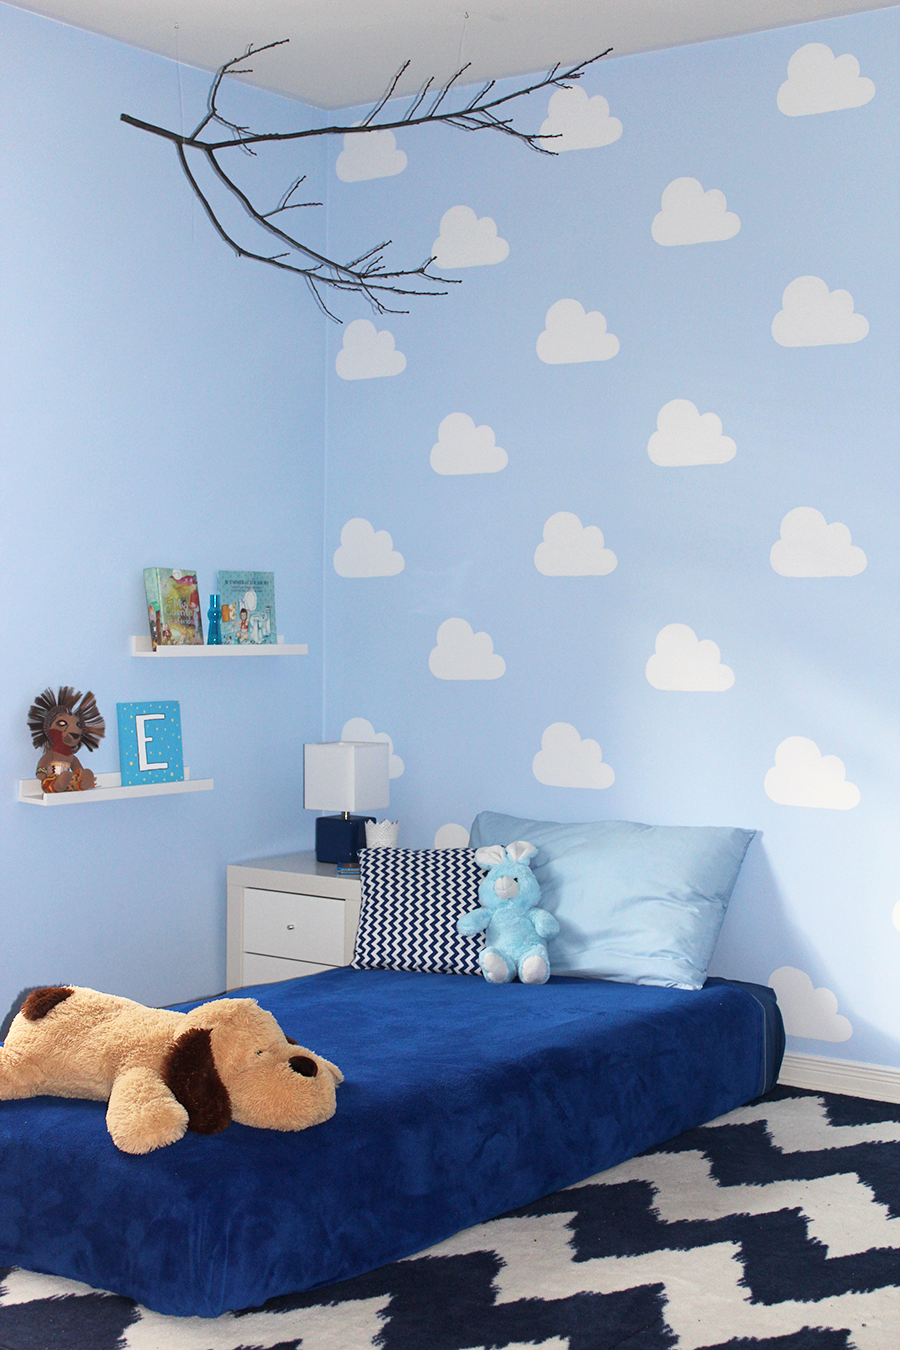 Diy Cloud Stencil For Kid S Bedroom Stencil Painted